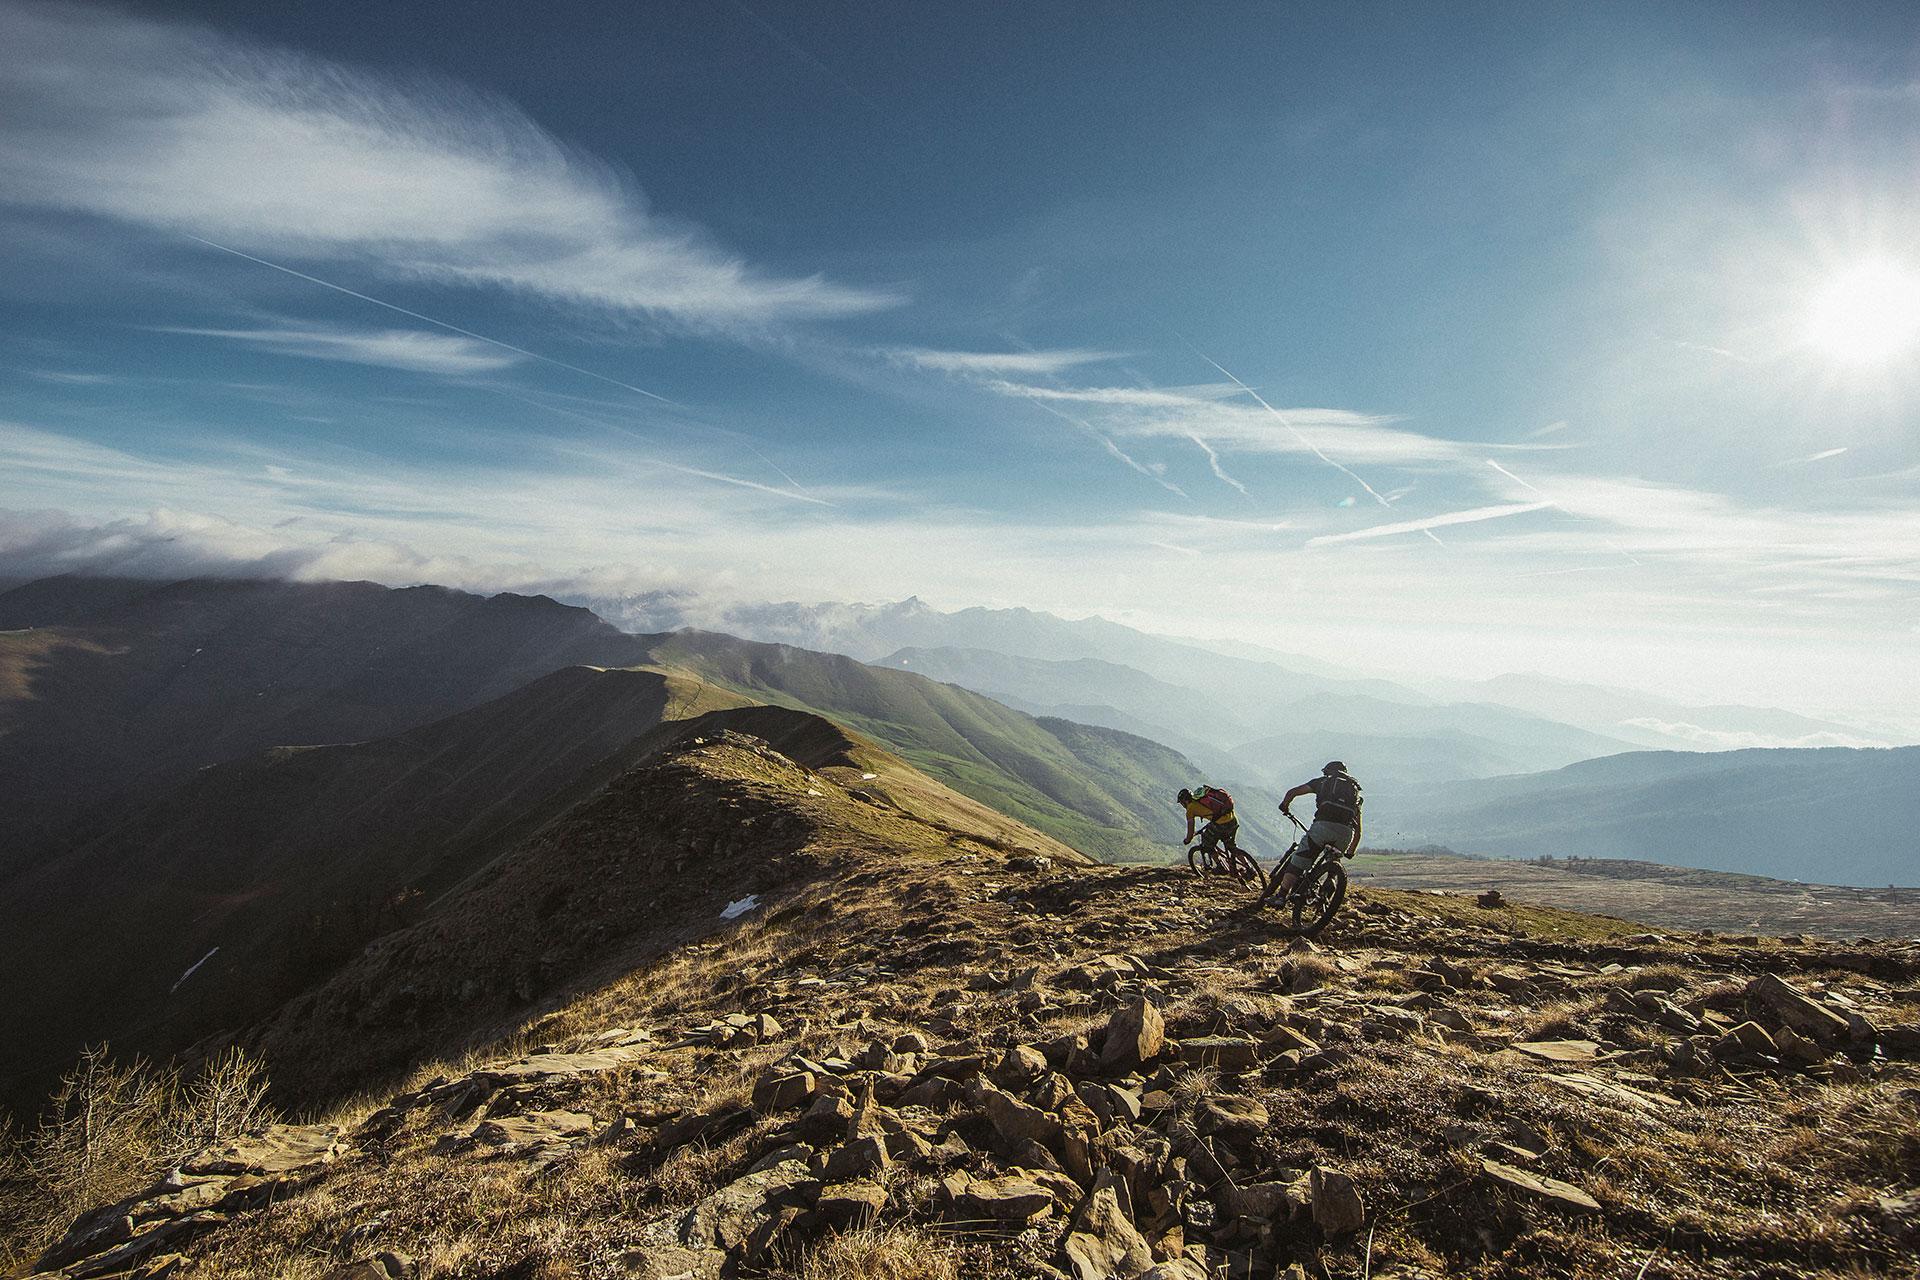 Berge Sport Outdoor Mountainbike Landschaft Fotograf Maloja Deuter Frankfurt